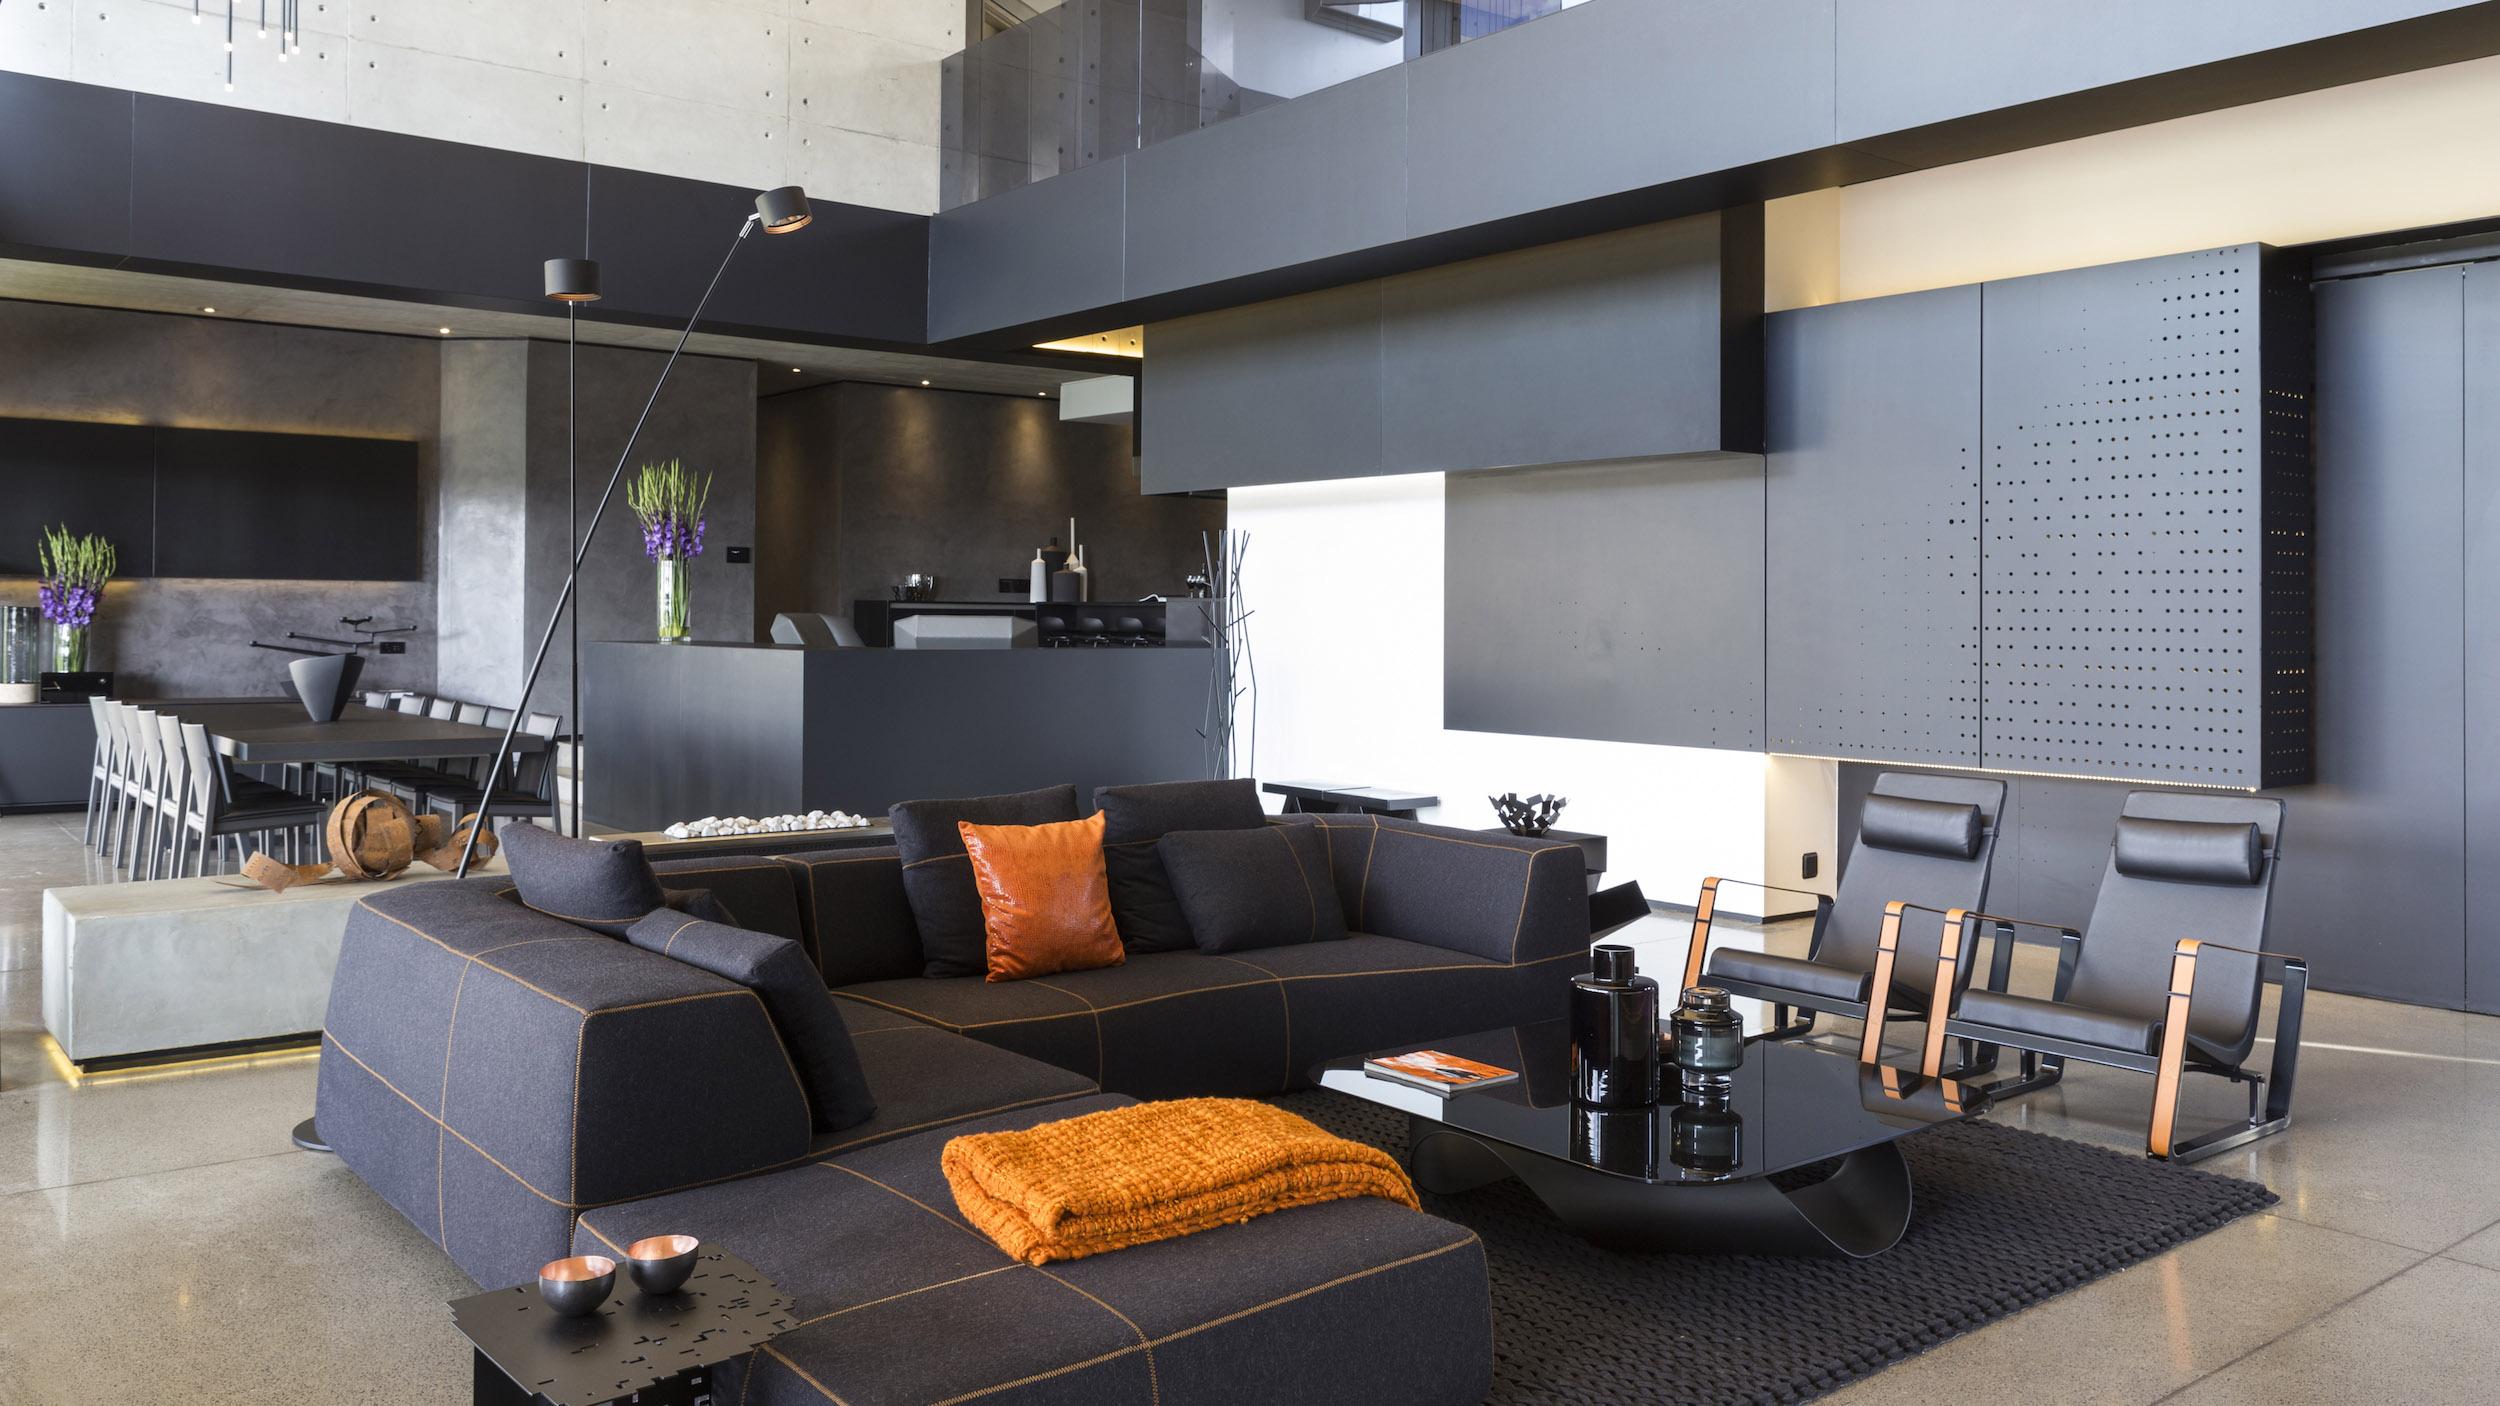 Kloof Road Masterpiece House in Johannesburg by Nico van der Meulen Architects-16